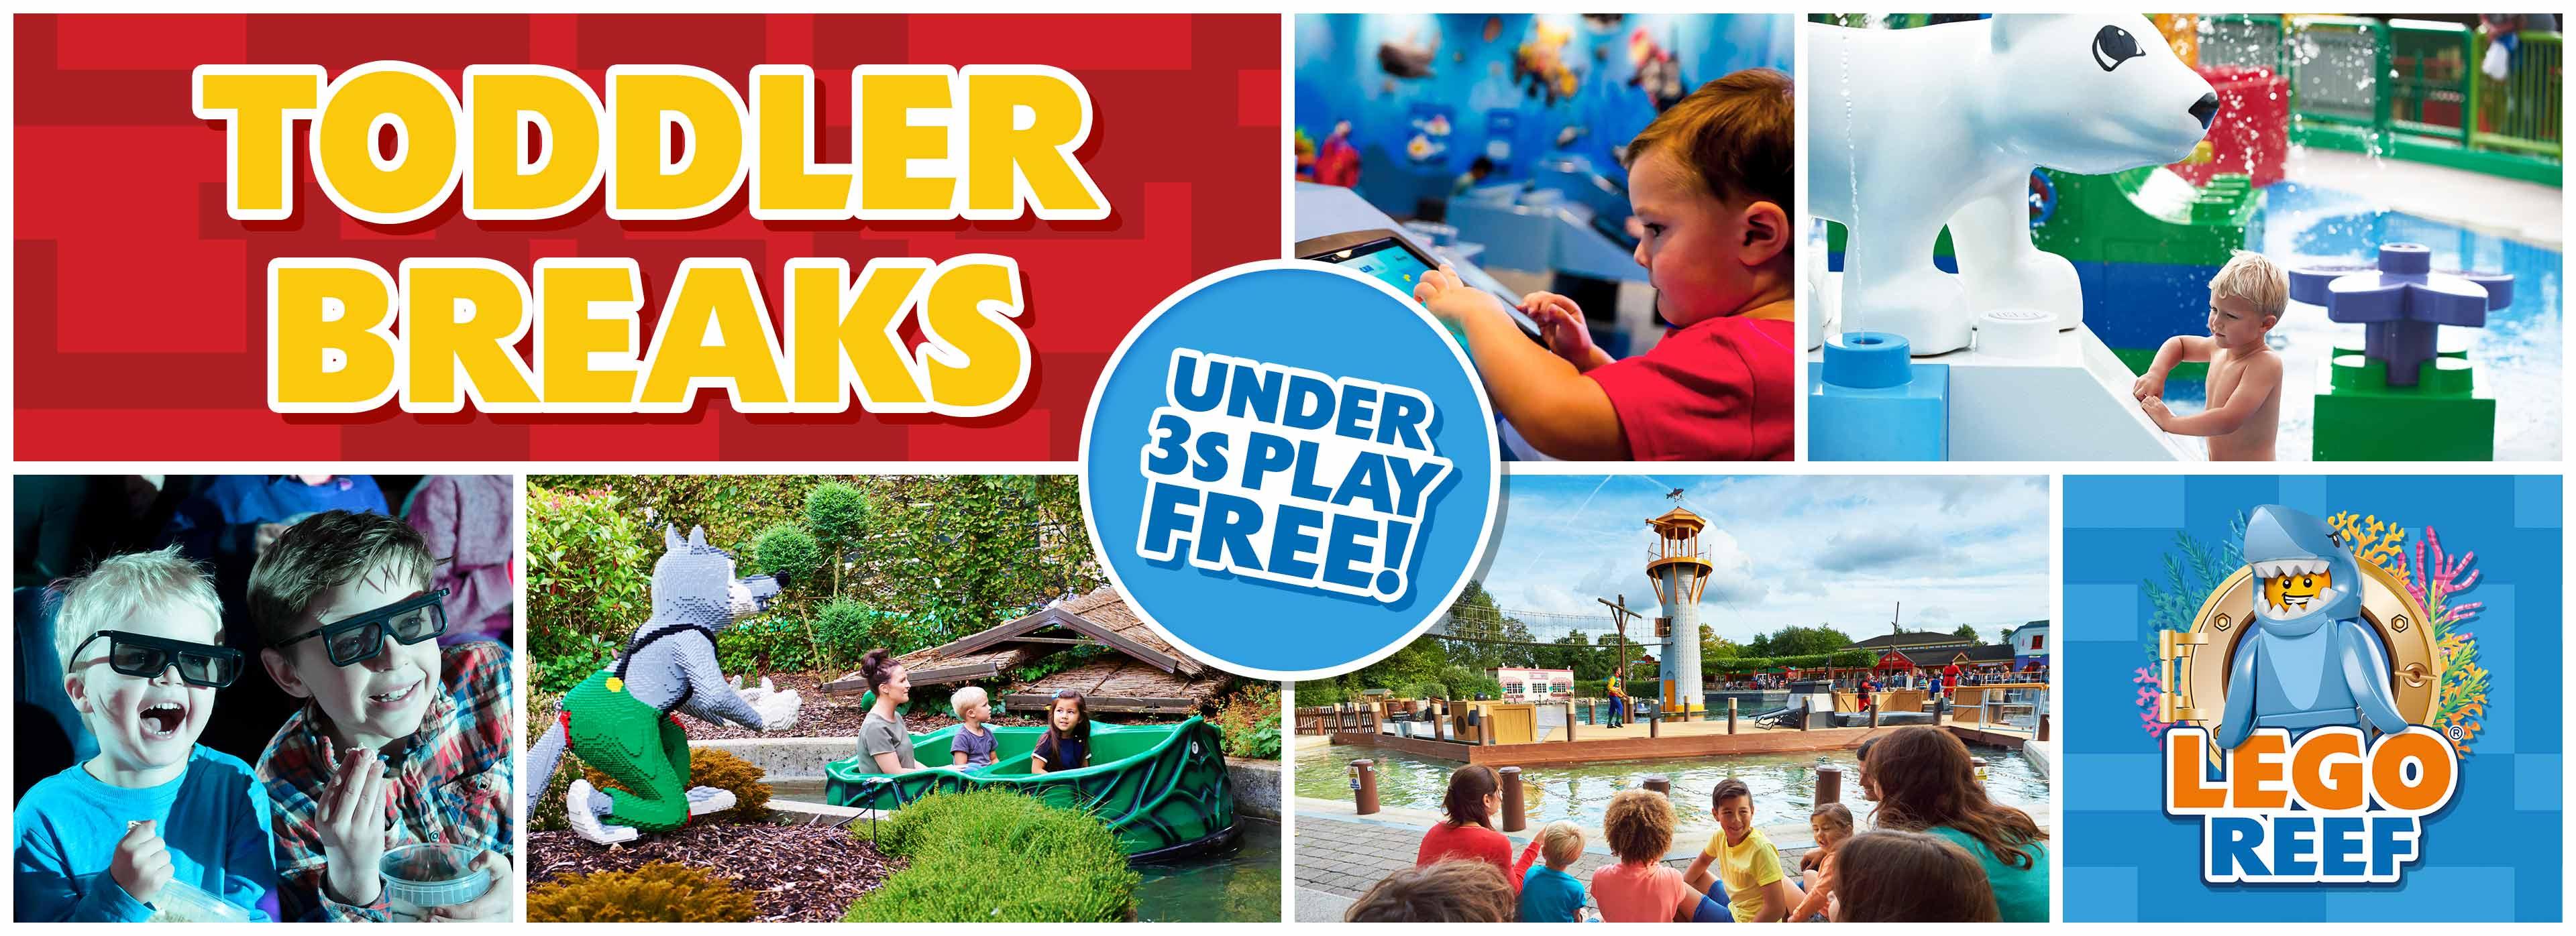 Under 3s Play FREE| LEGOLAND Holidays